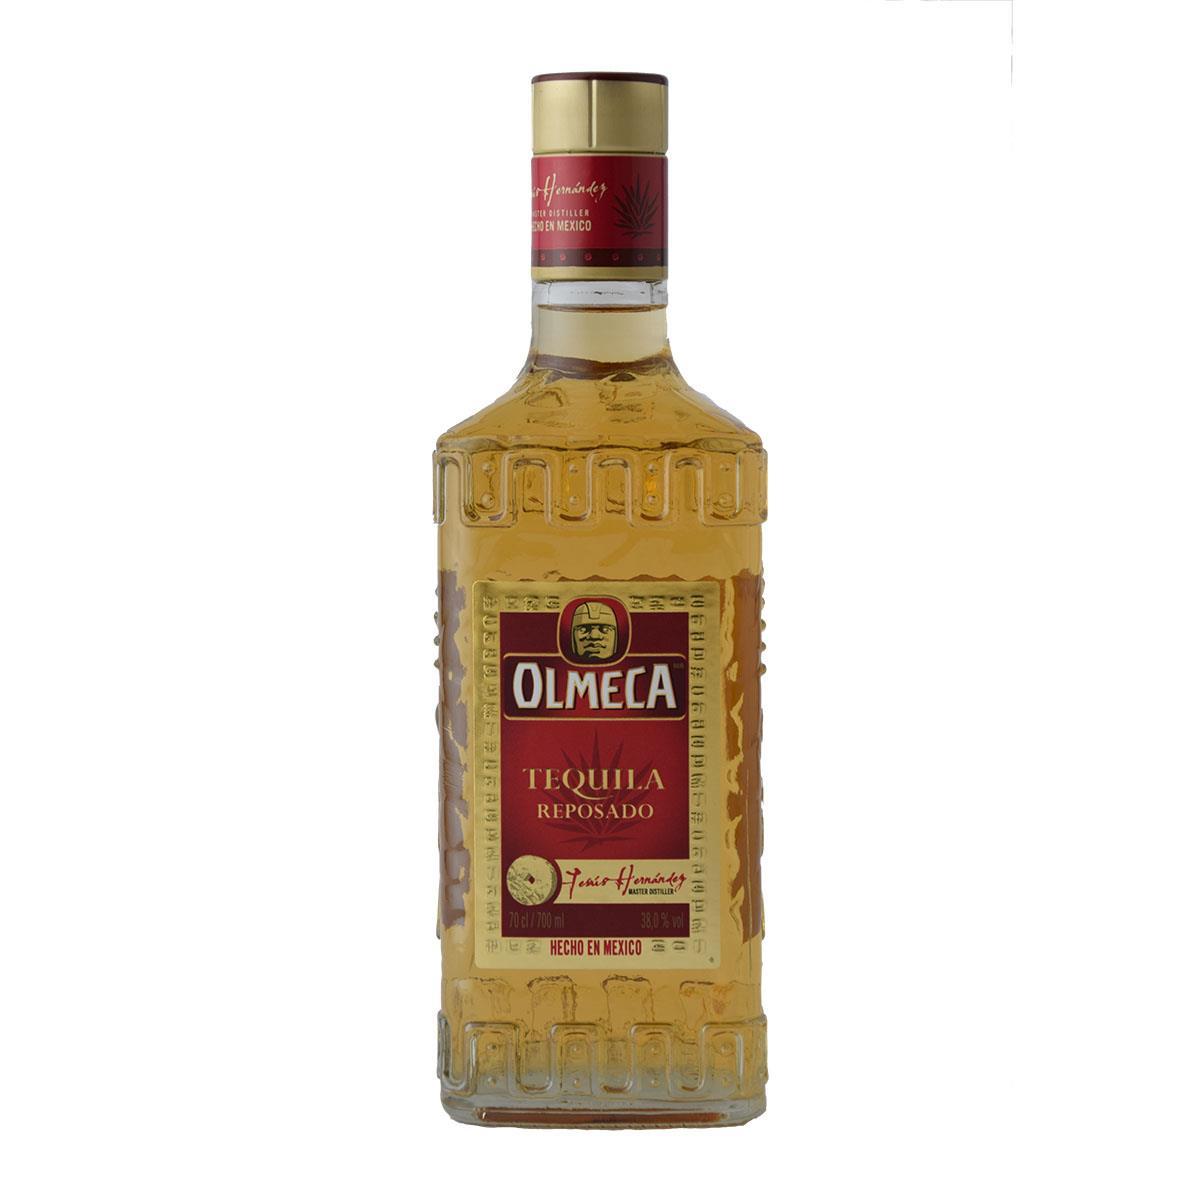 Olmeca Reposado Tequila 700ml